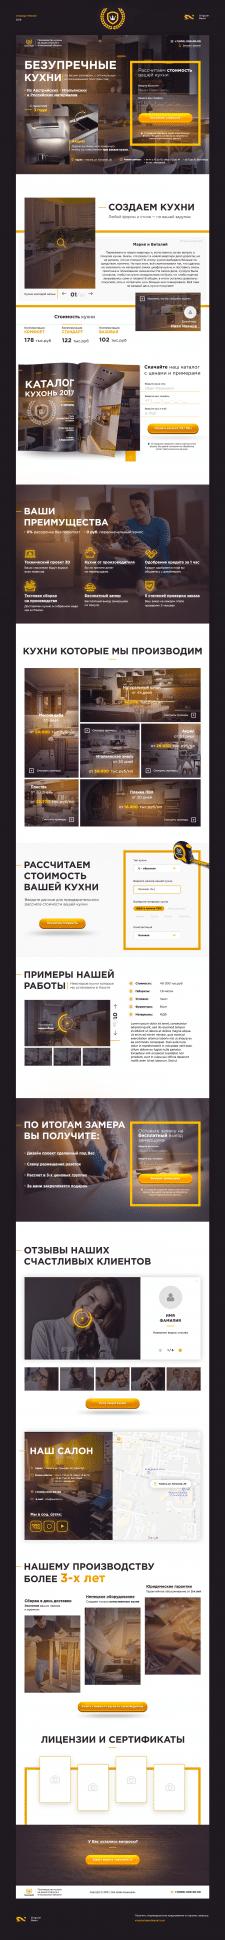 SmeraldO — Производство кухонь на заказ.  2018.